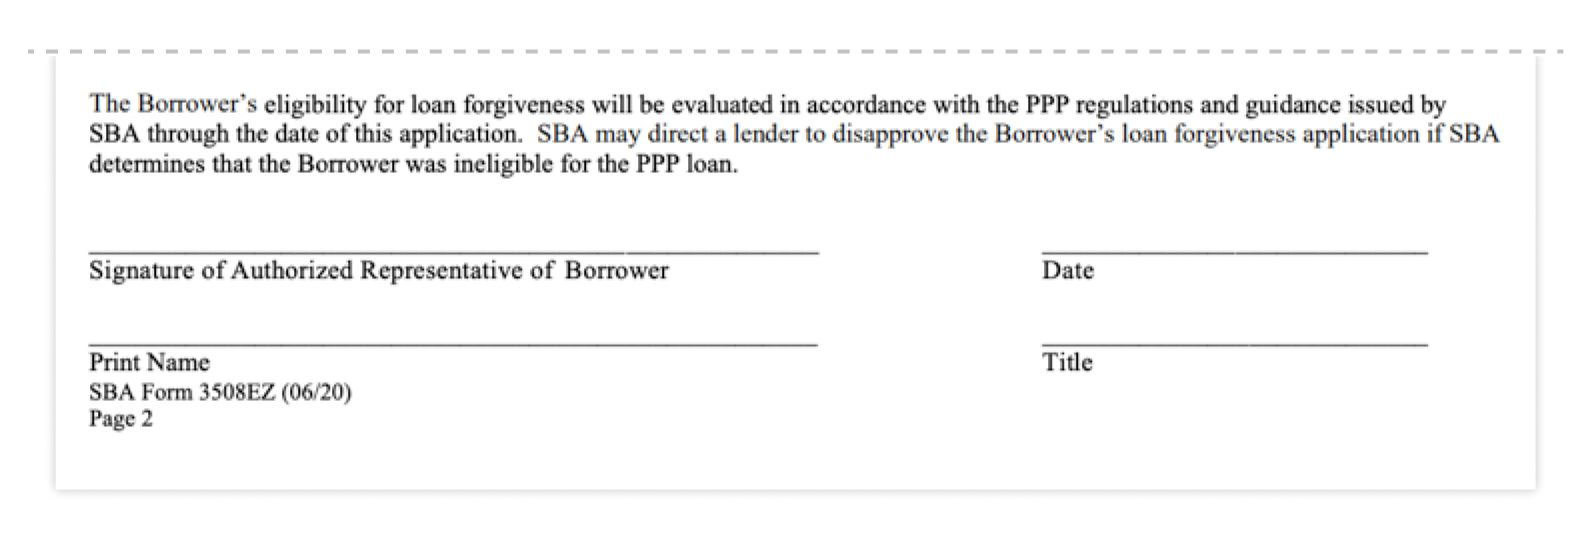 ppp loan forgiveness application form 3508ez signature